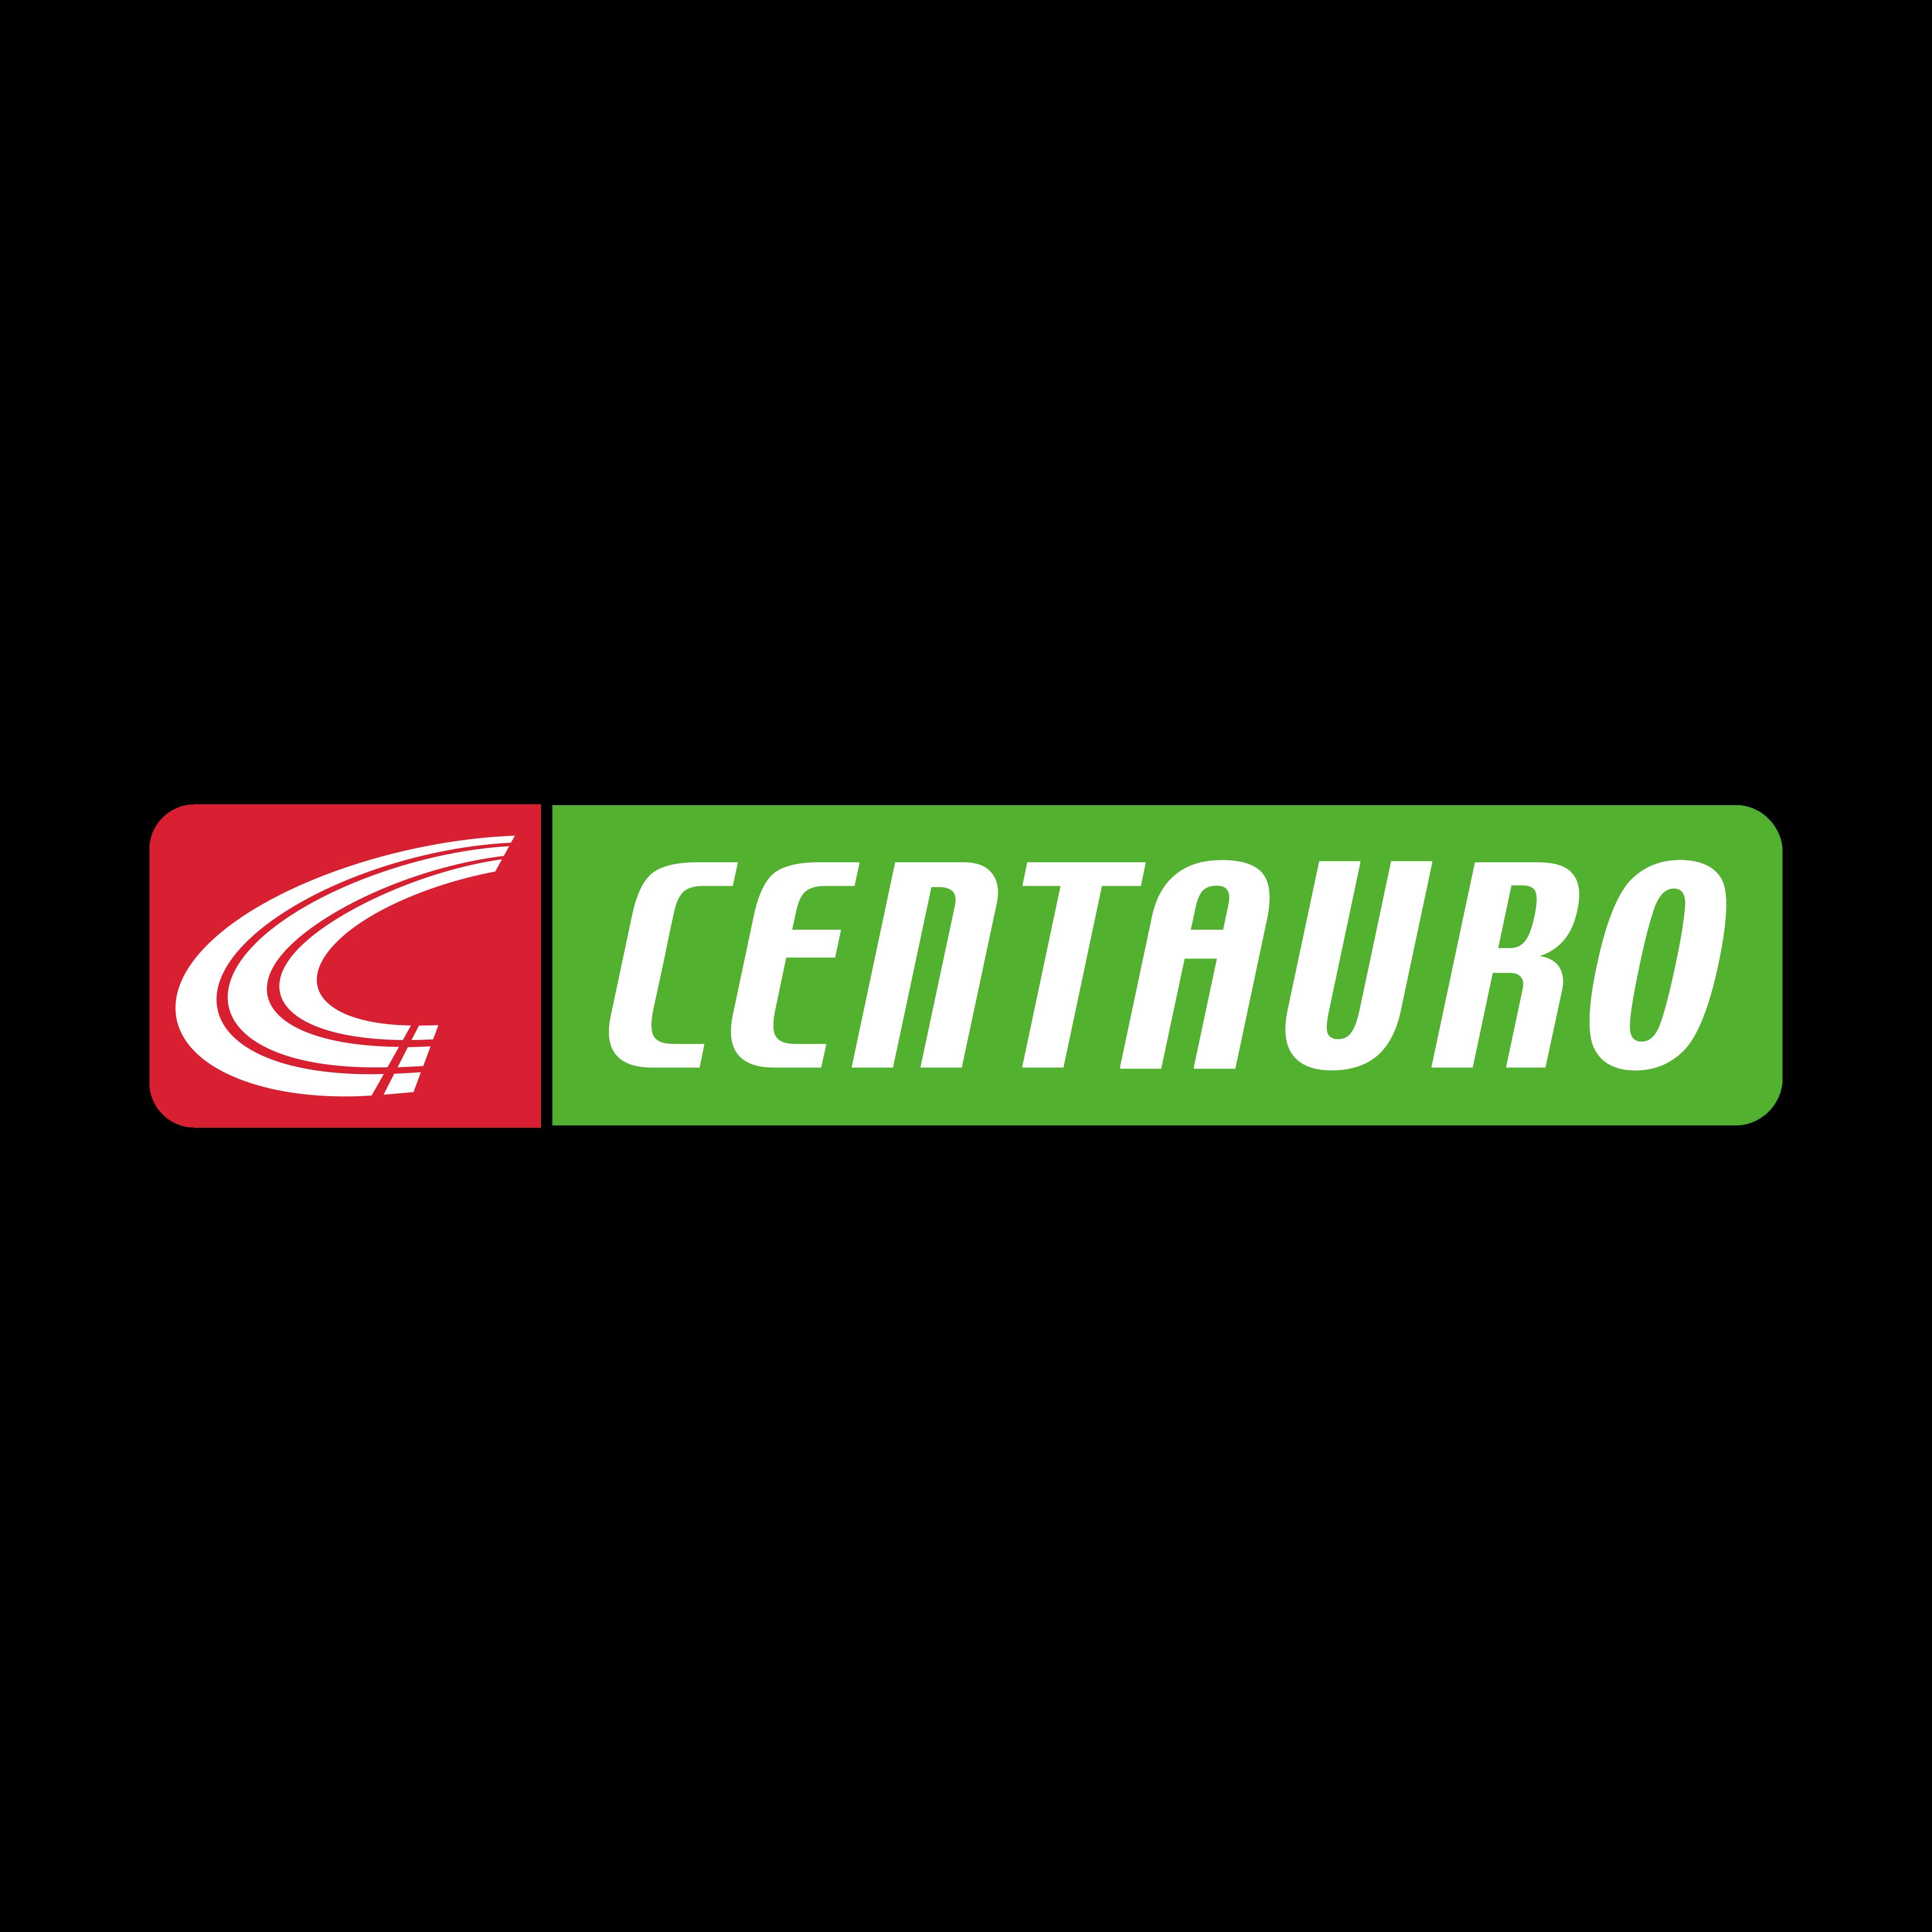 centauro logo 0 - Centauro Logo